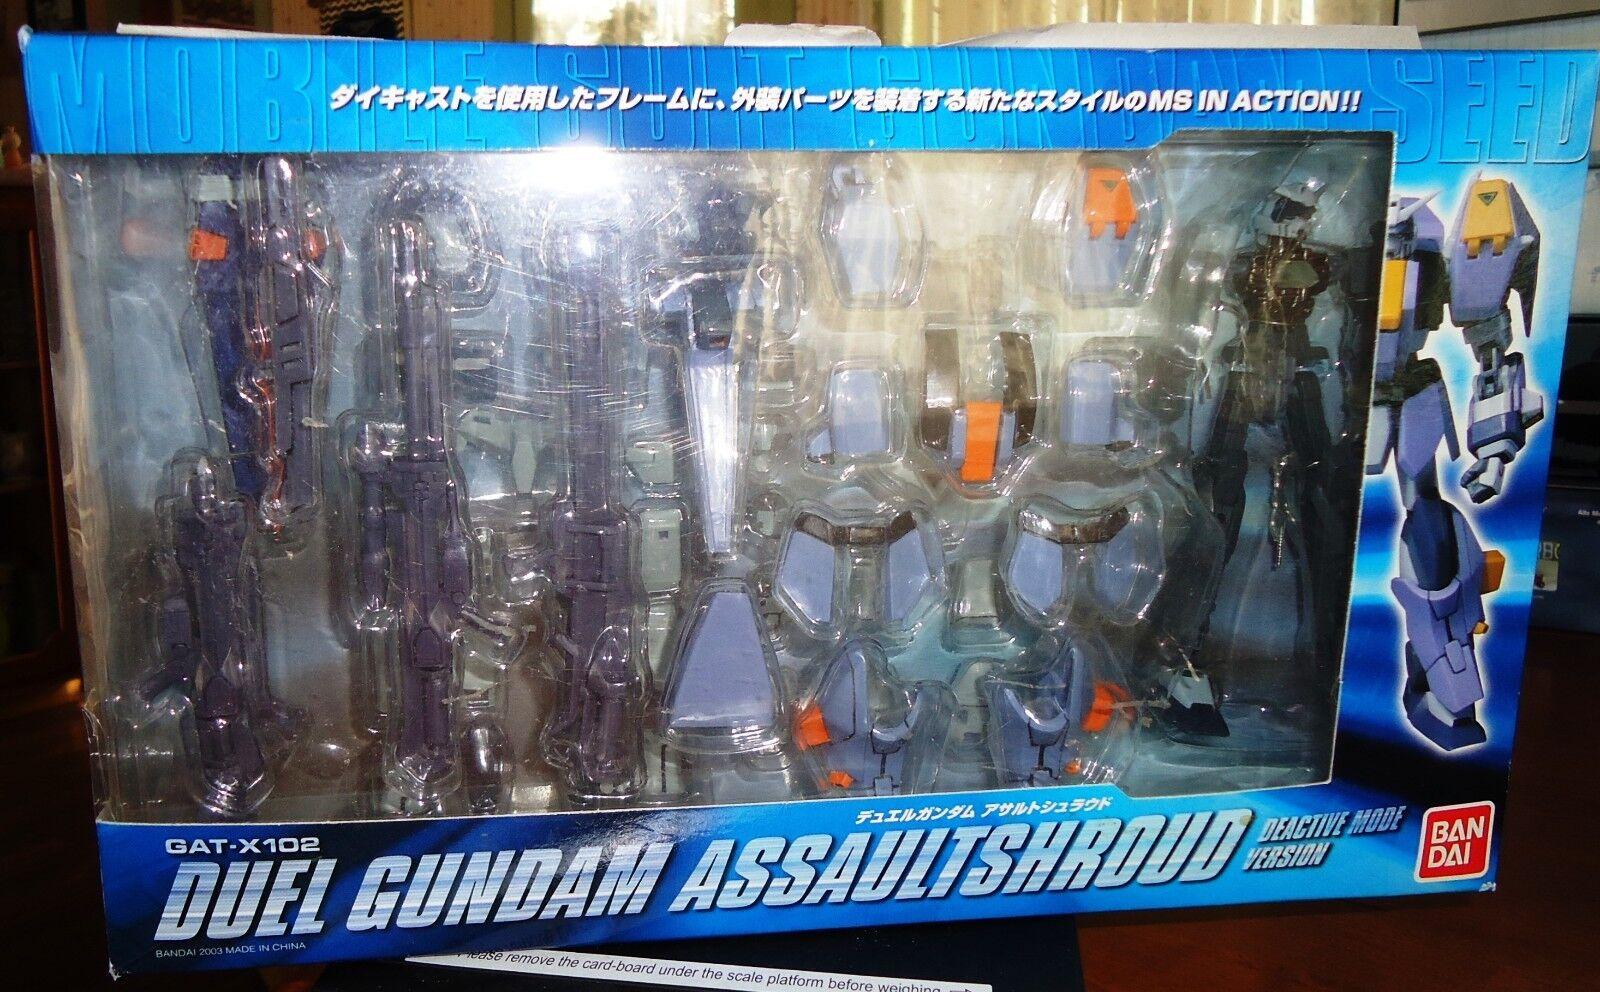 BANDAI 2003 GAT-X102 Duel Gundam SEED Action Figure Deactive Mode Version - NIB